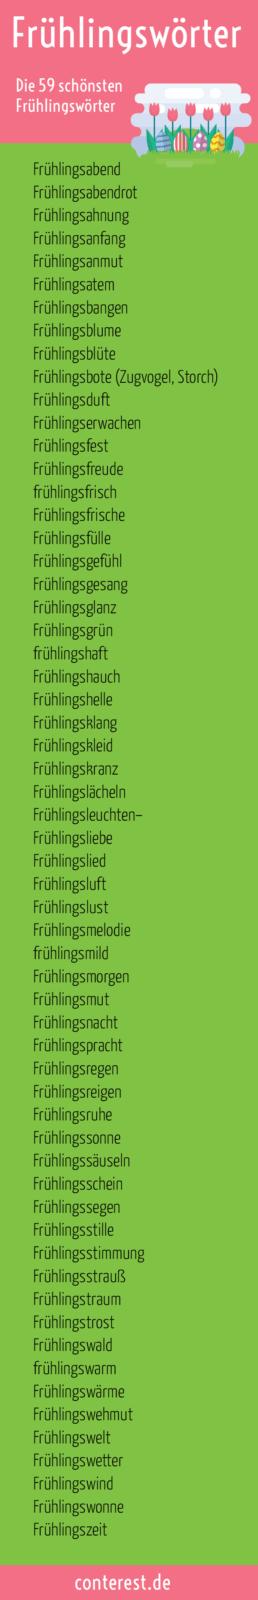 Frühlingswörter – Wortliste